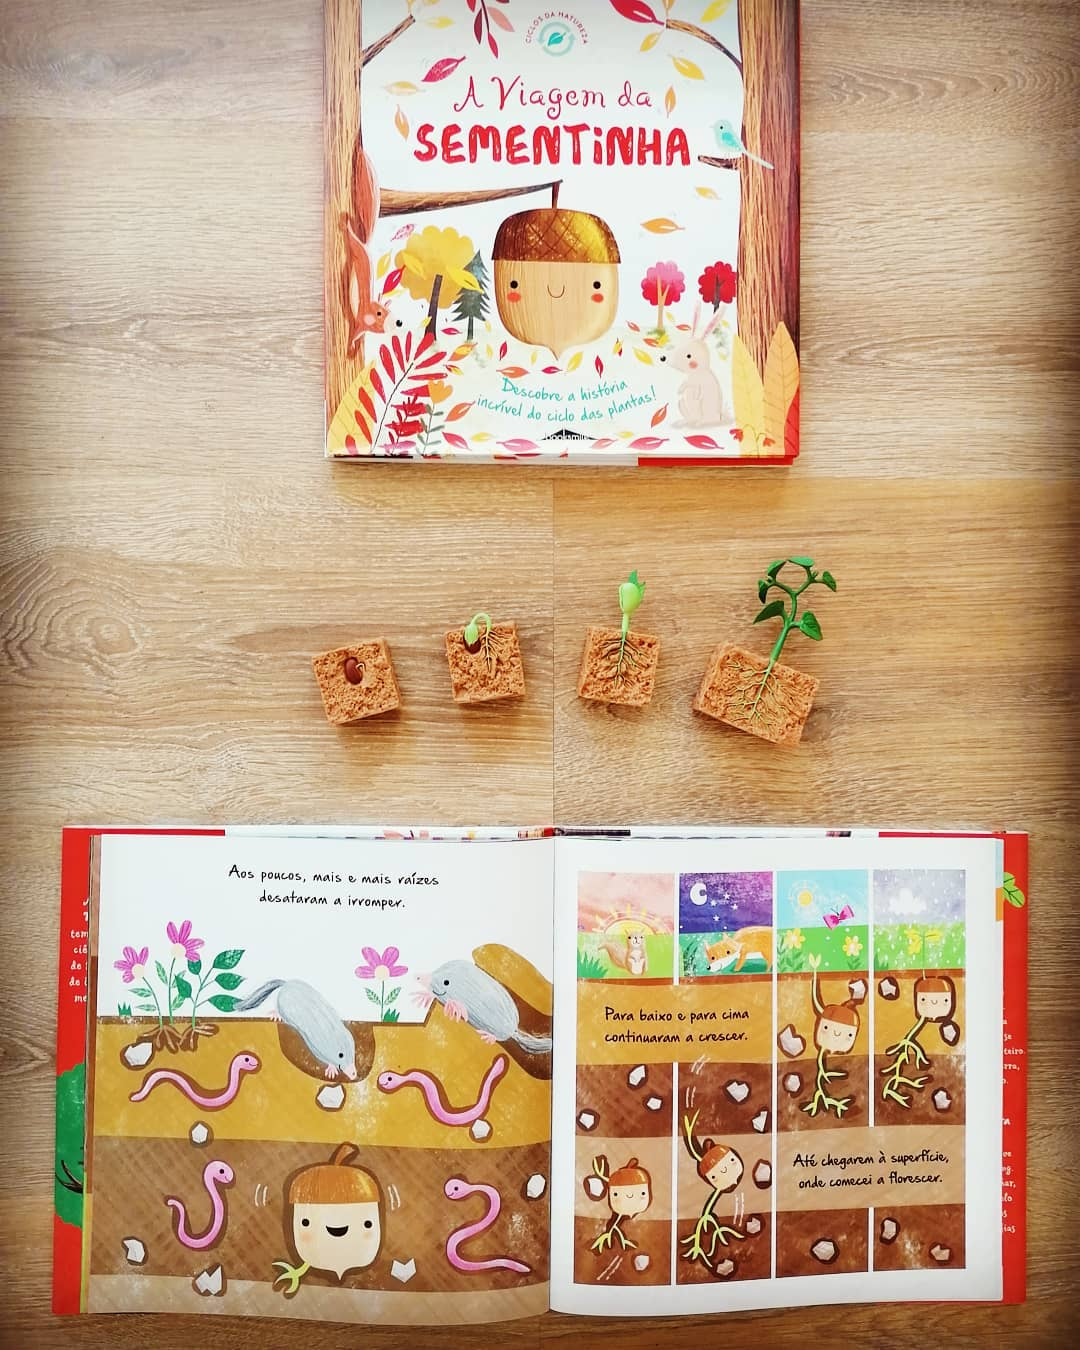 Pack Ciclo de Vida da Planta